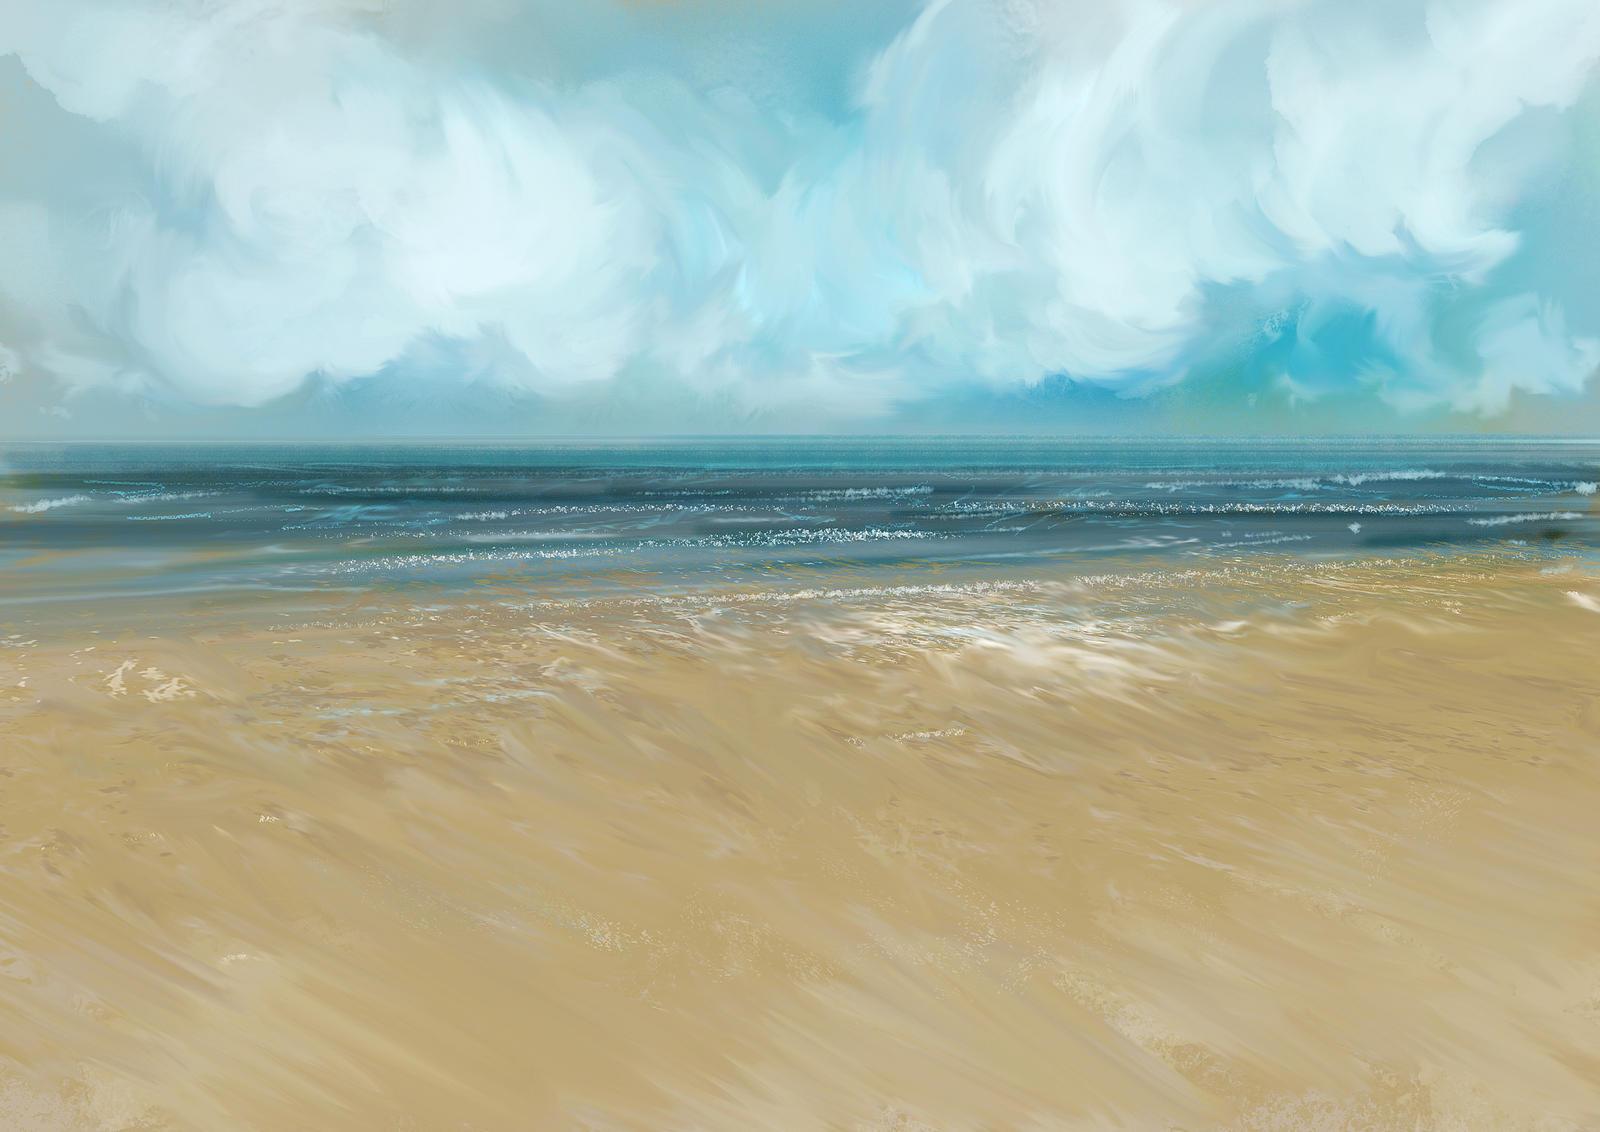 Beach study by tonyhurst